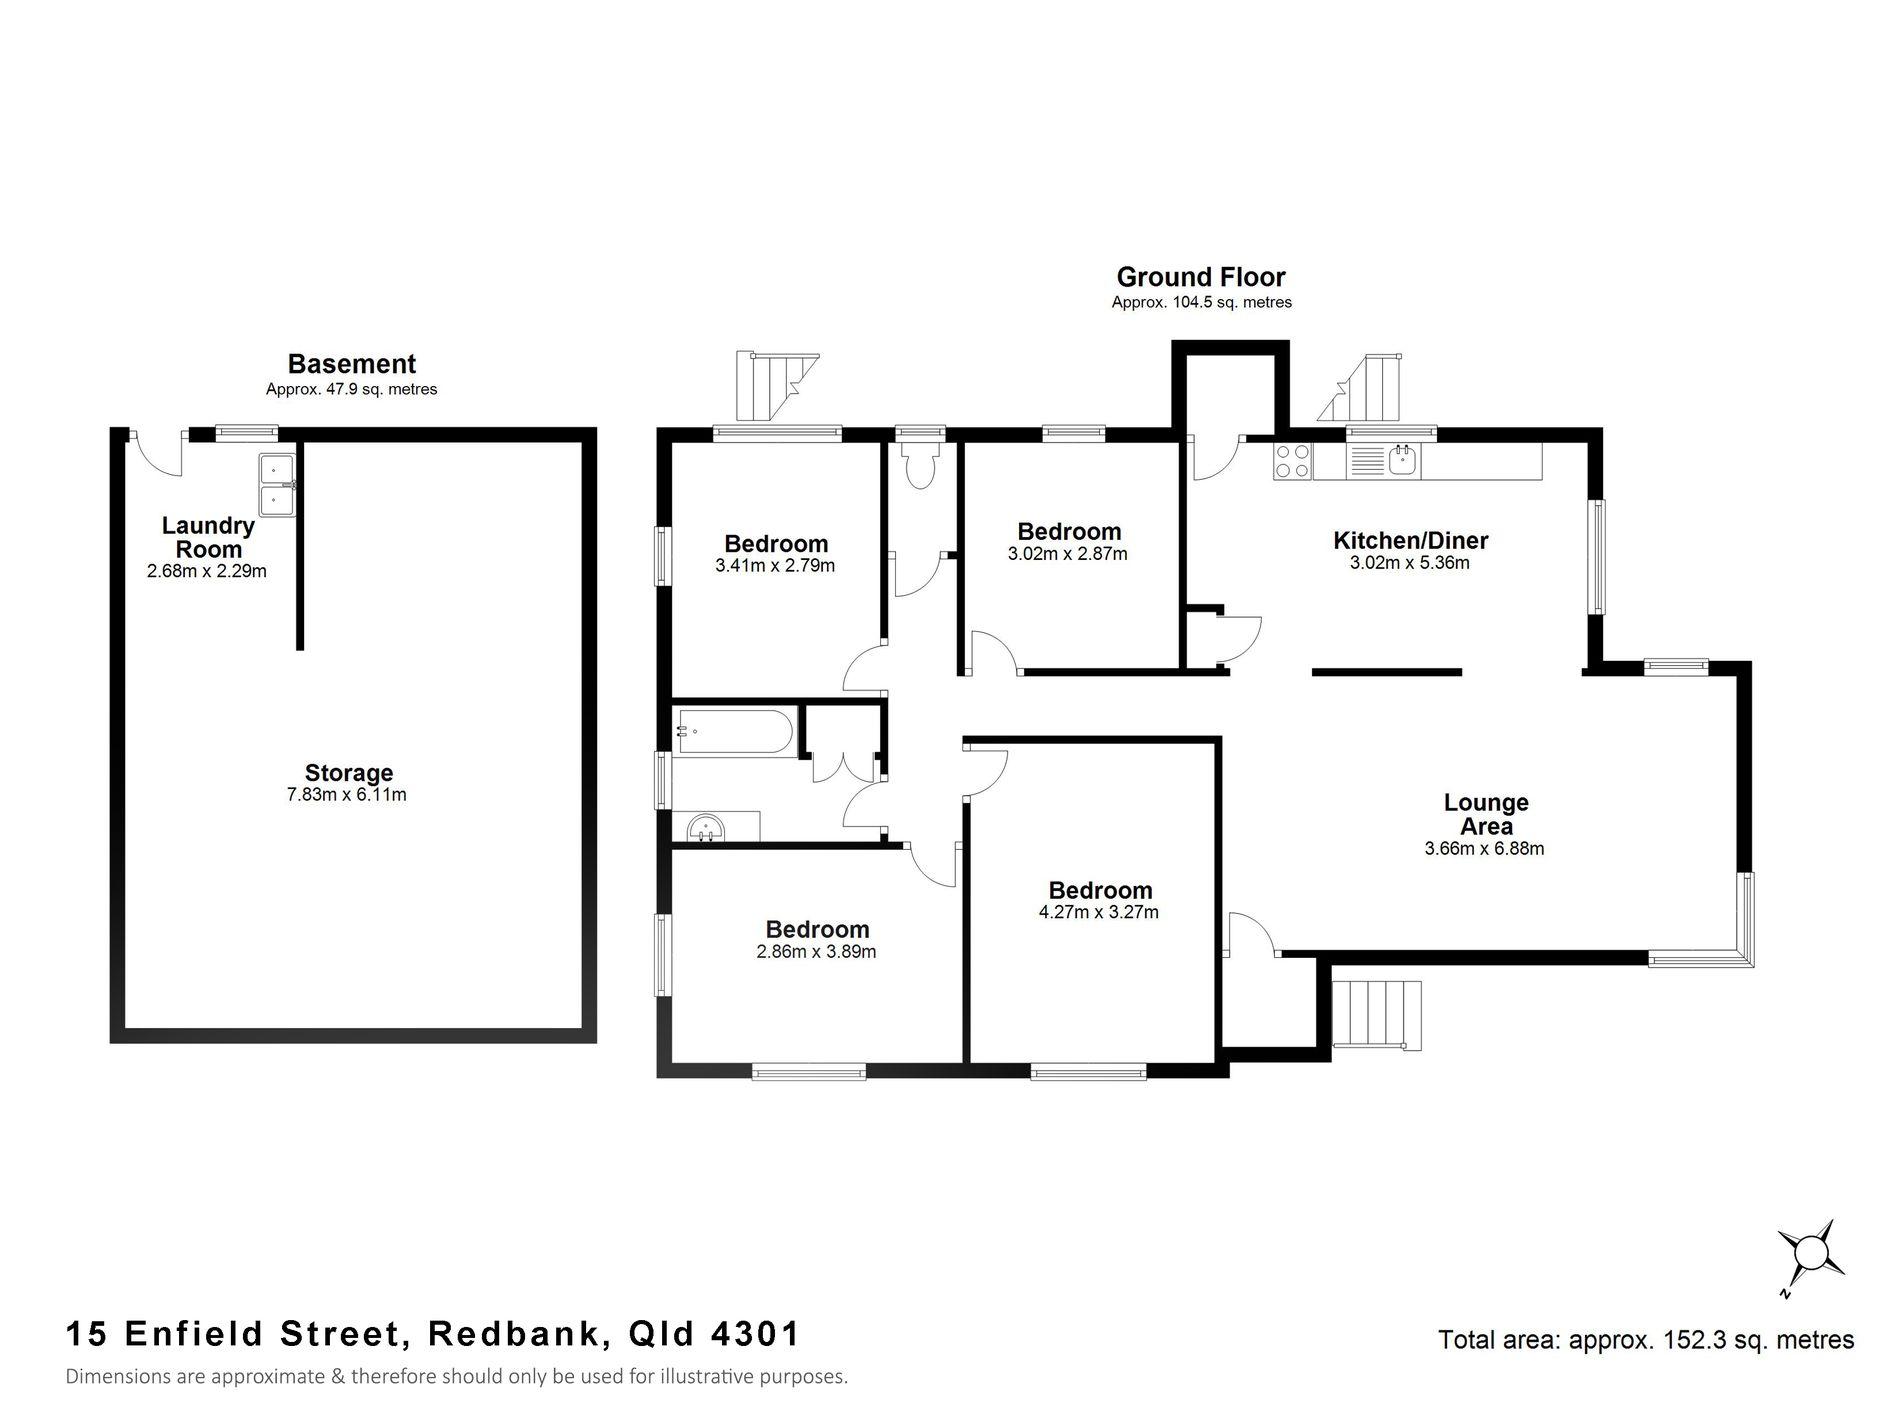 15 Enfield Street, Redbank